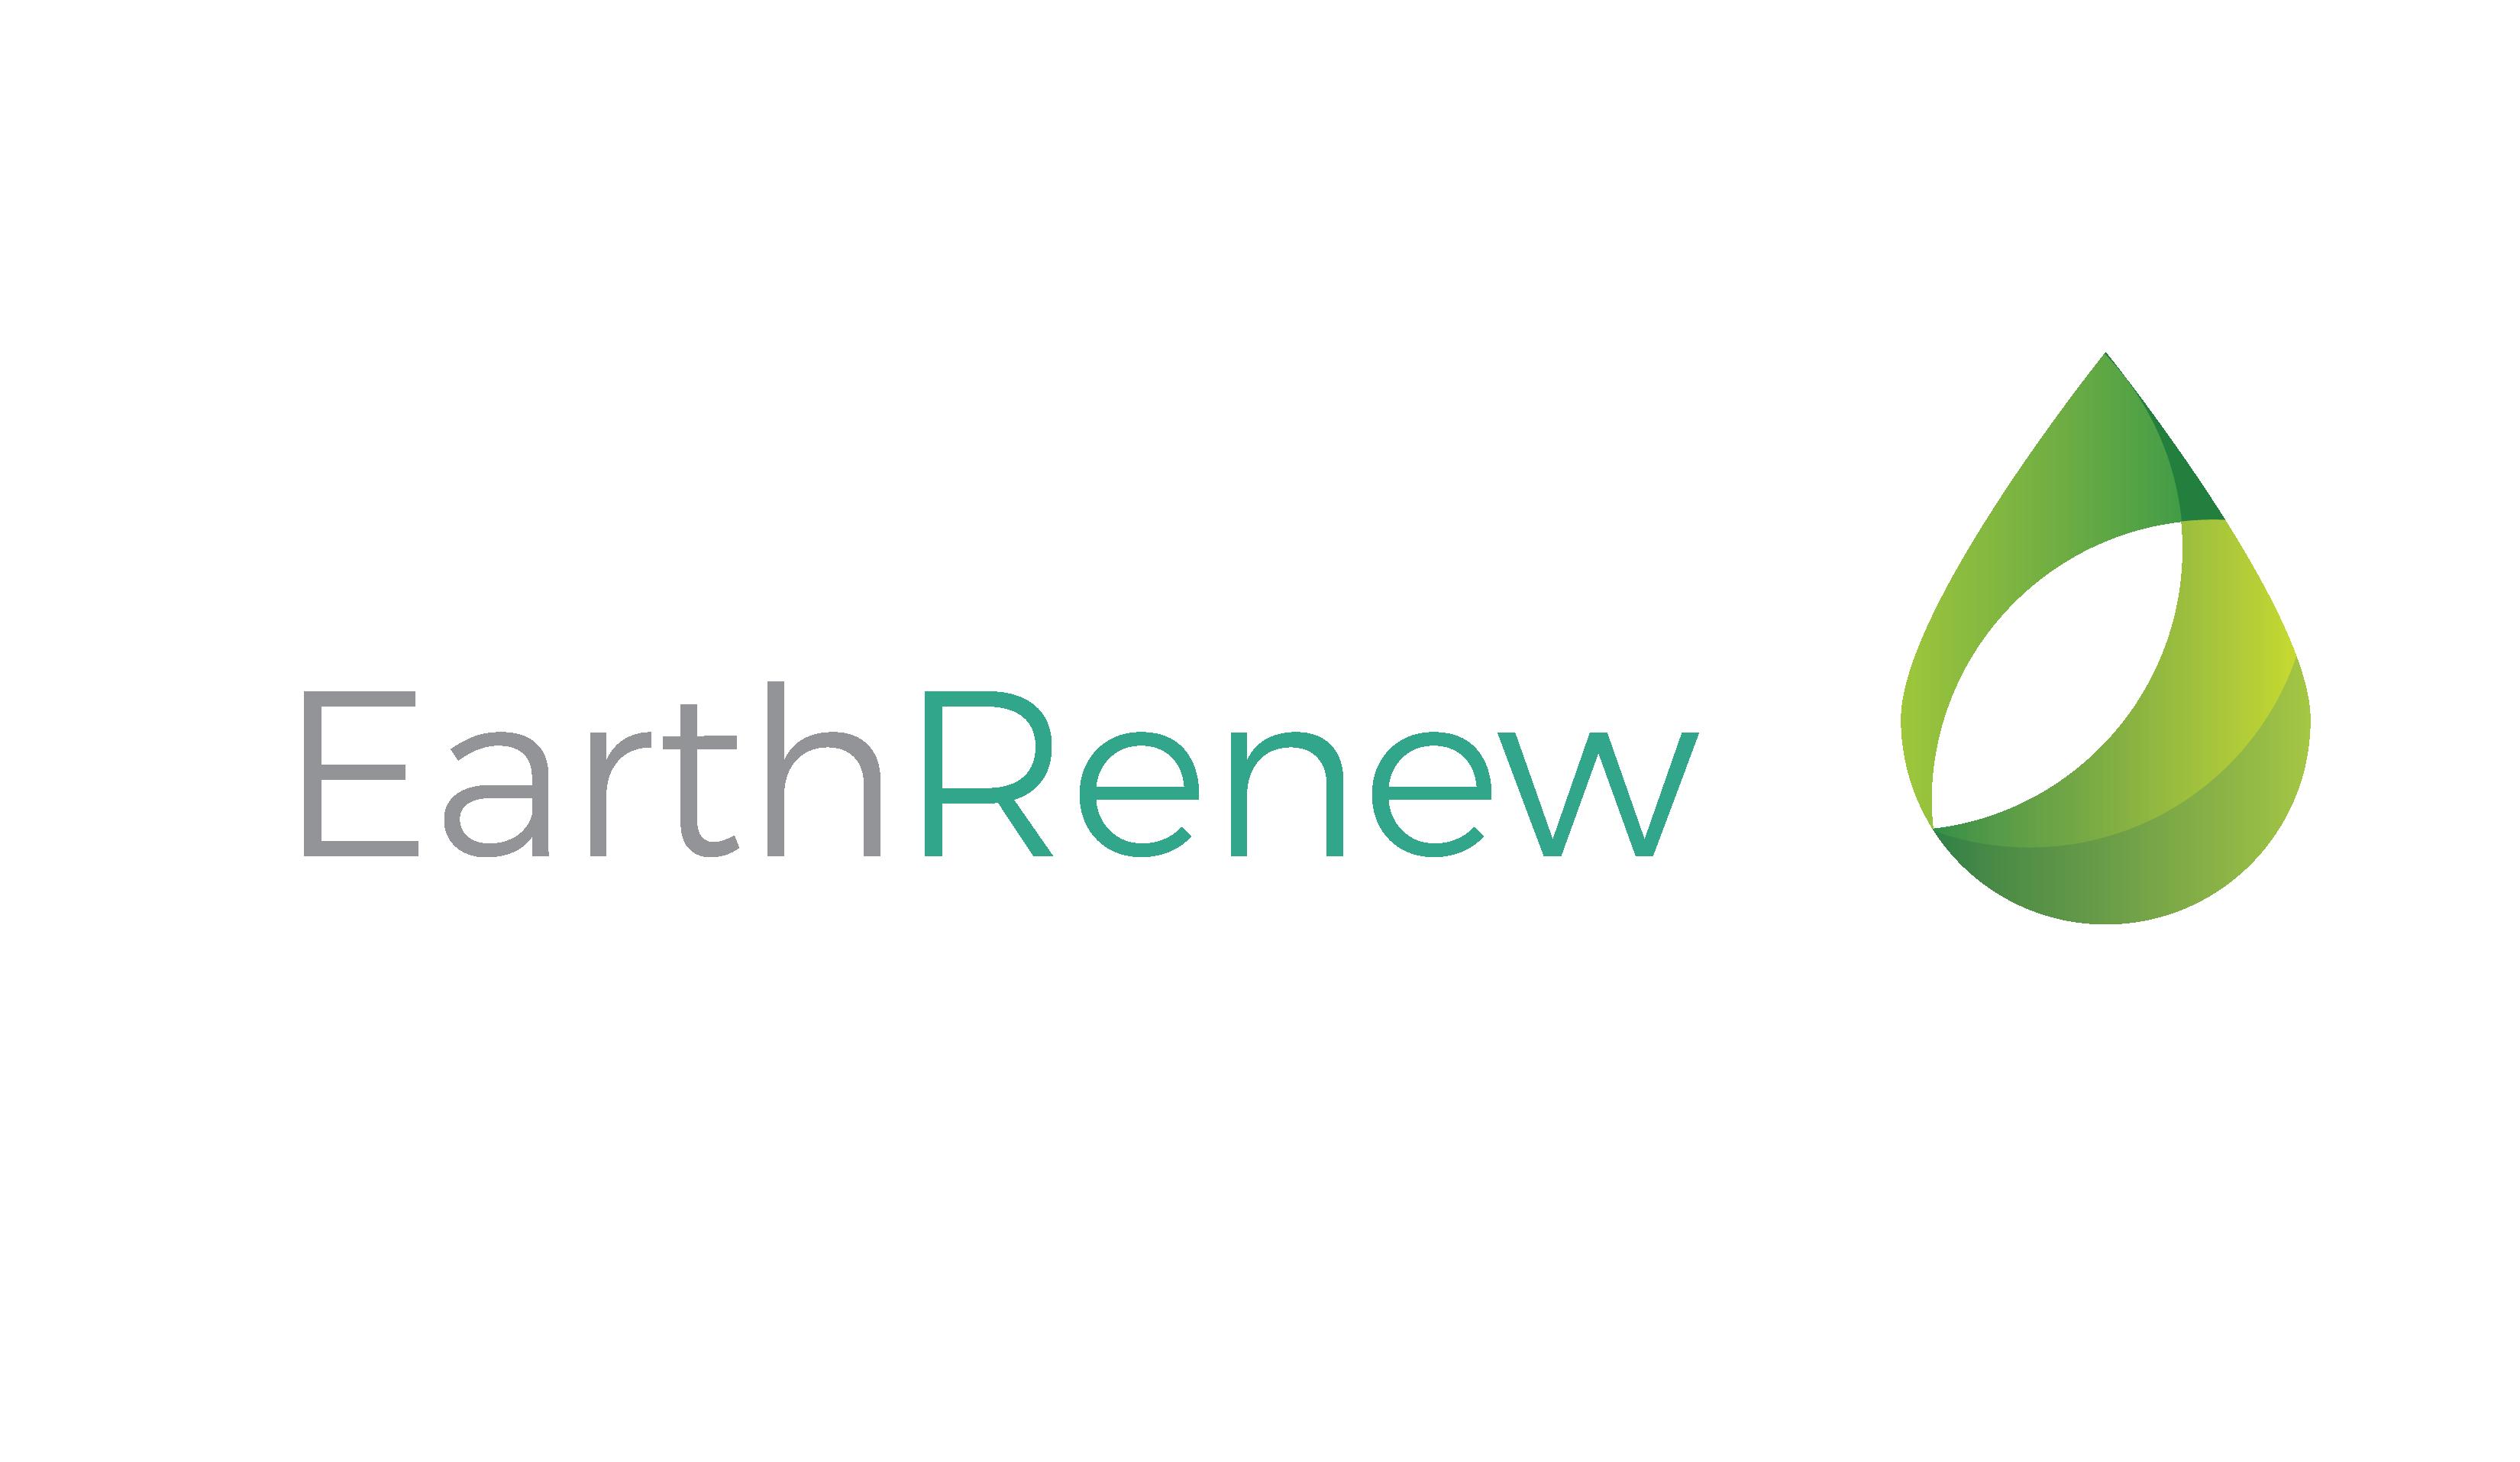 EarthRenew Launches Program to Restart Electricity Generation